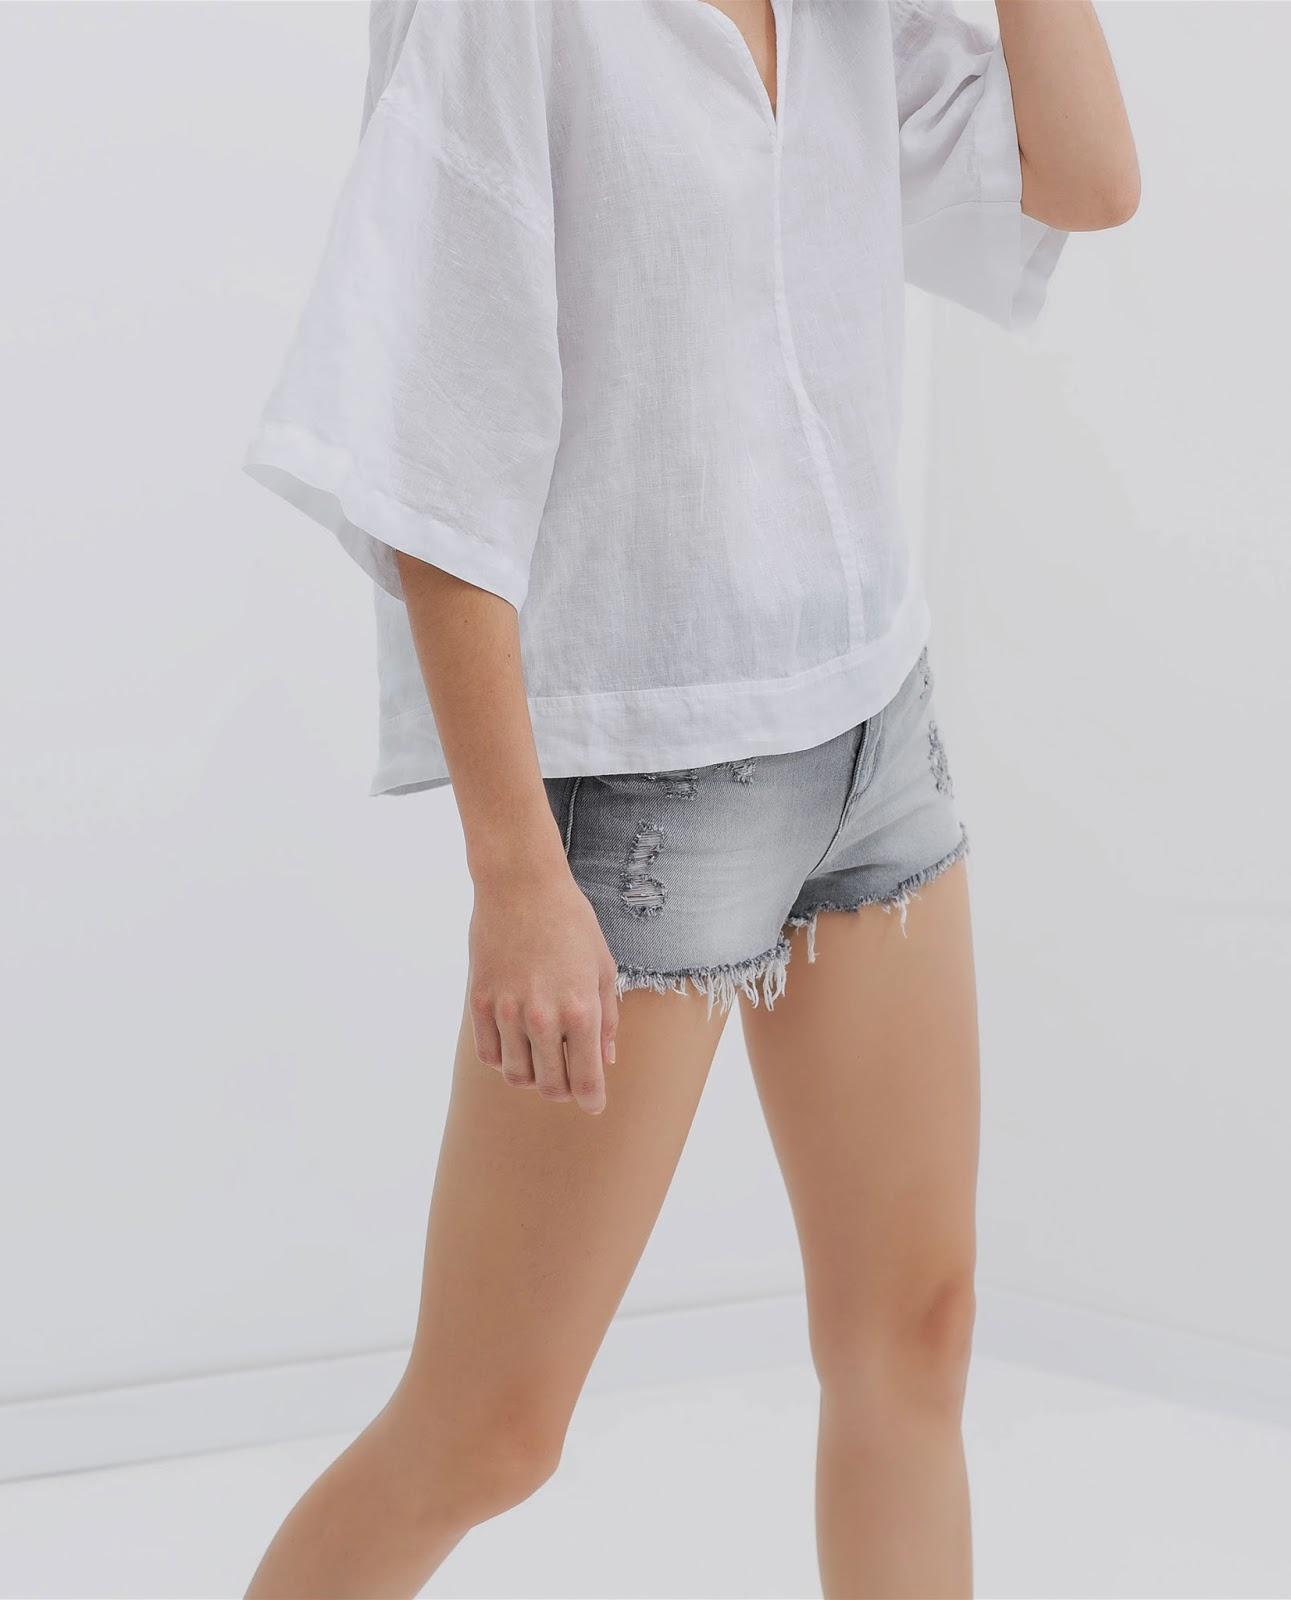 zara grey shorts